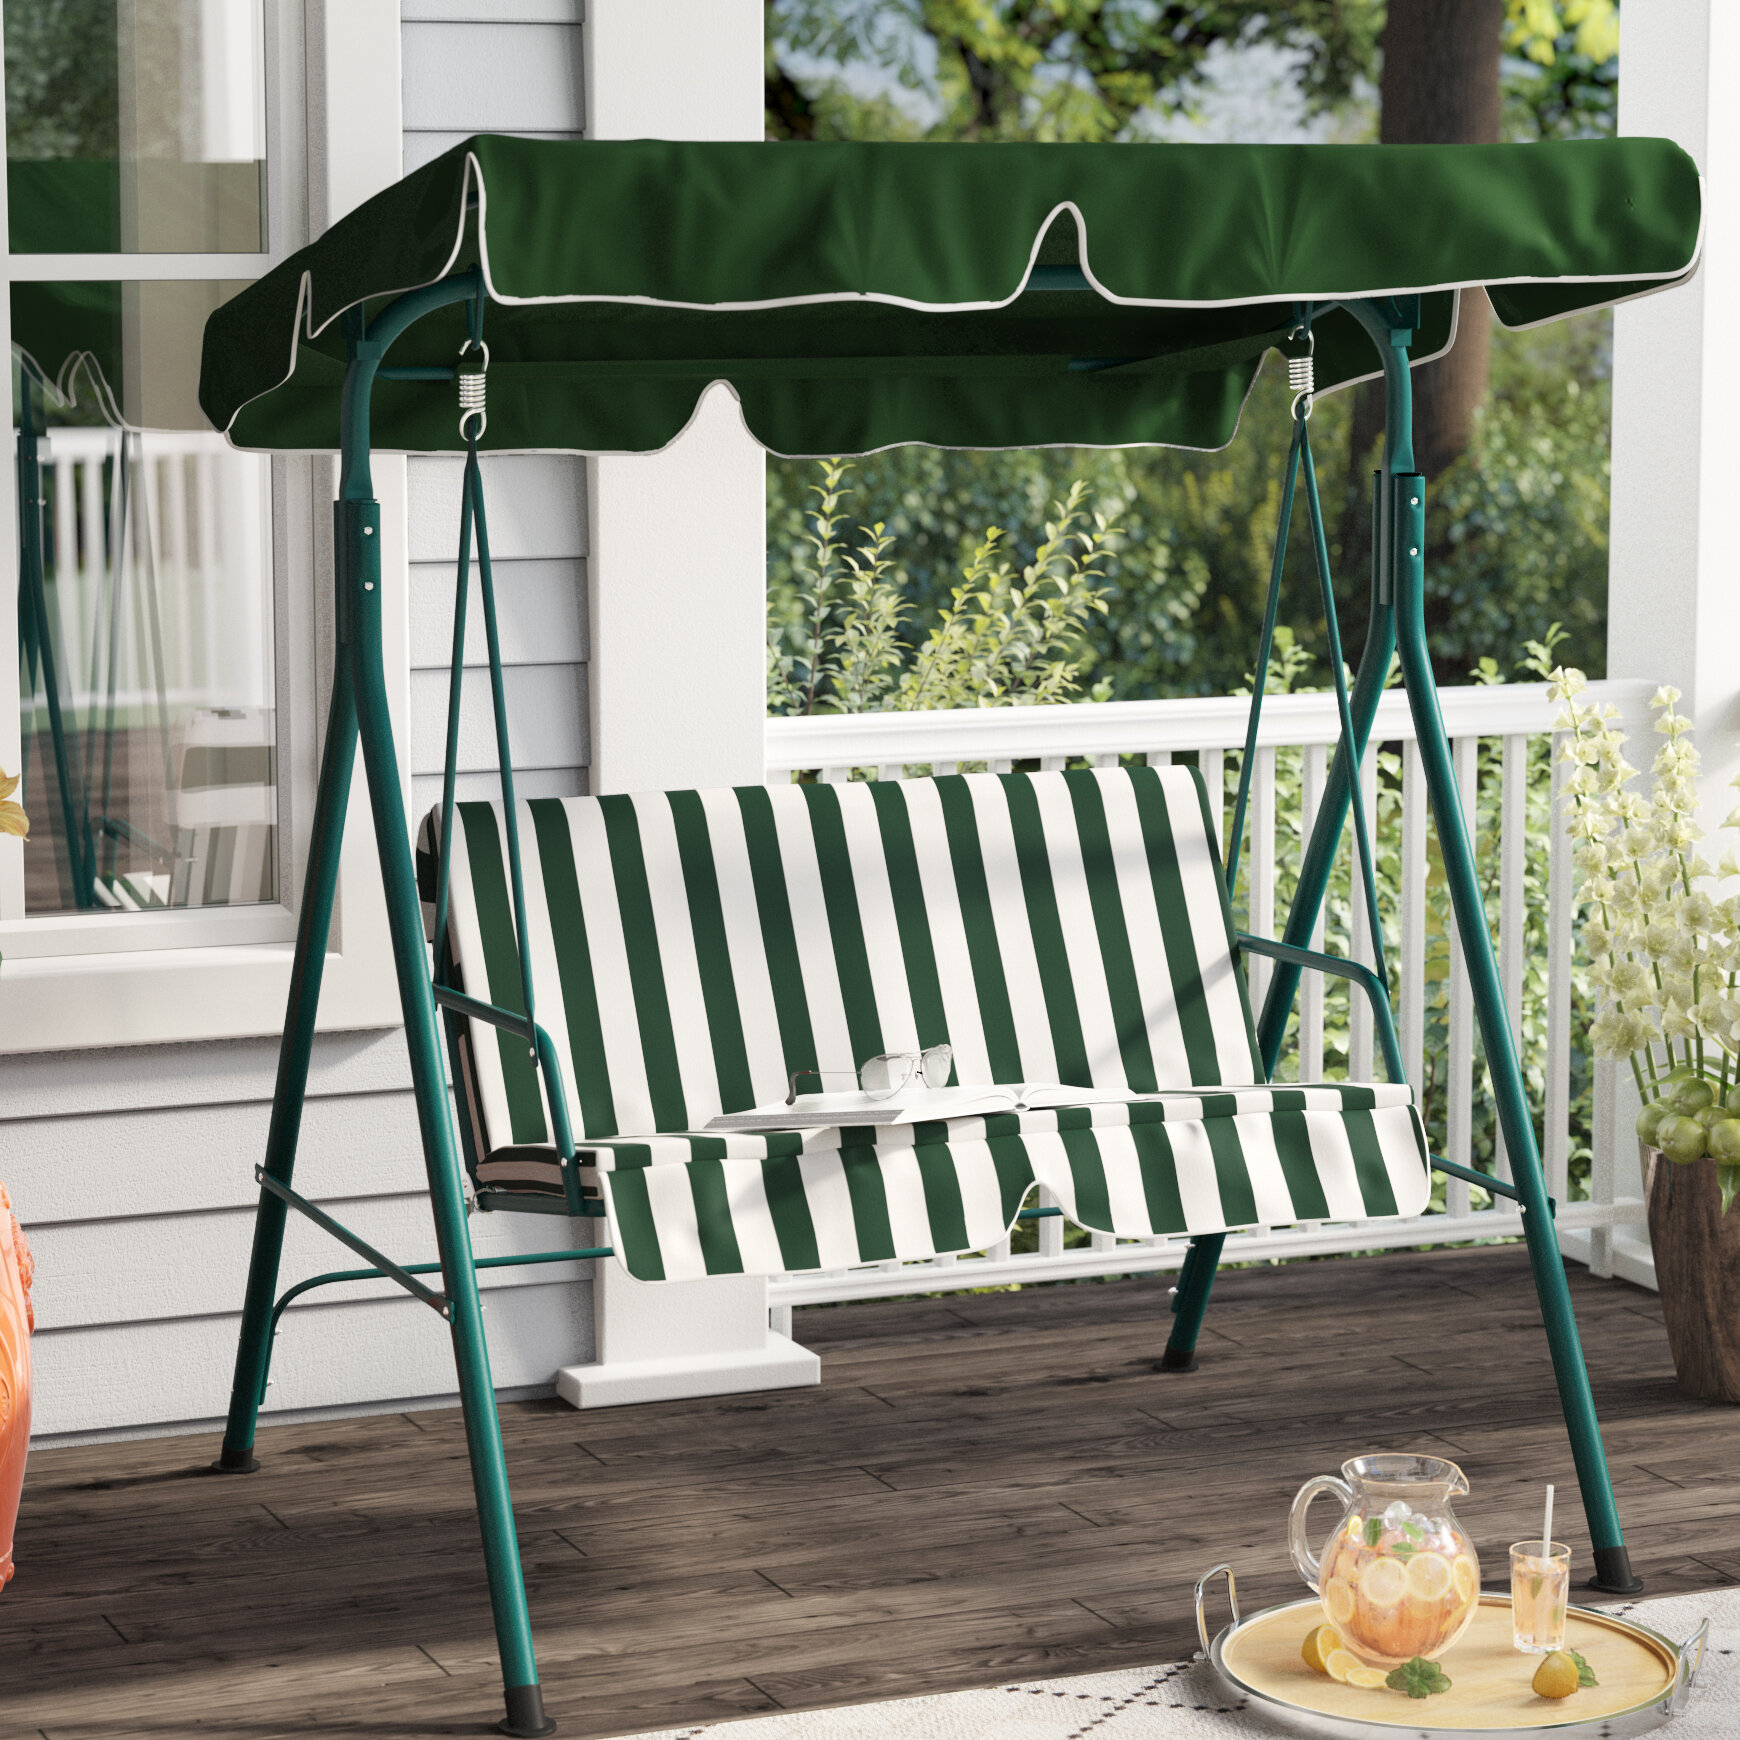 Proothi Patio Loveseat Canopy Hammock Porch Swing With Stand With Regard To Patio Loveseat Canopy Hammock Porch Swings With Stand (Image 24 of 25)